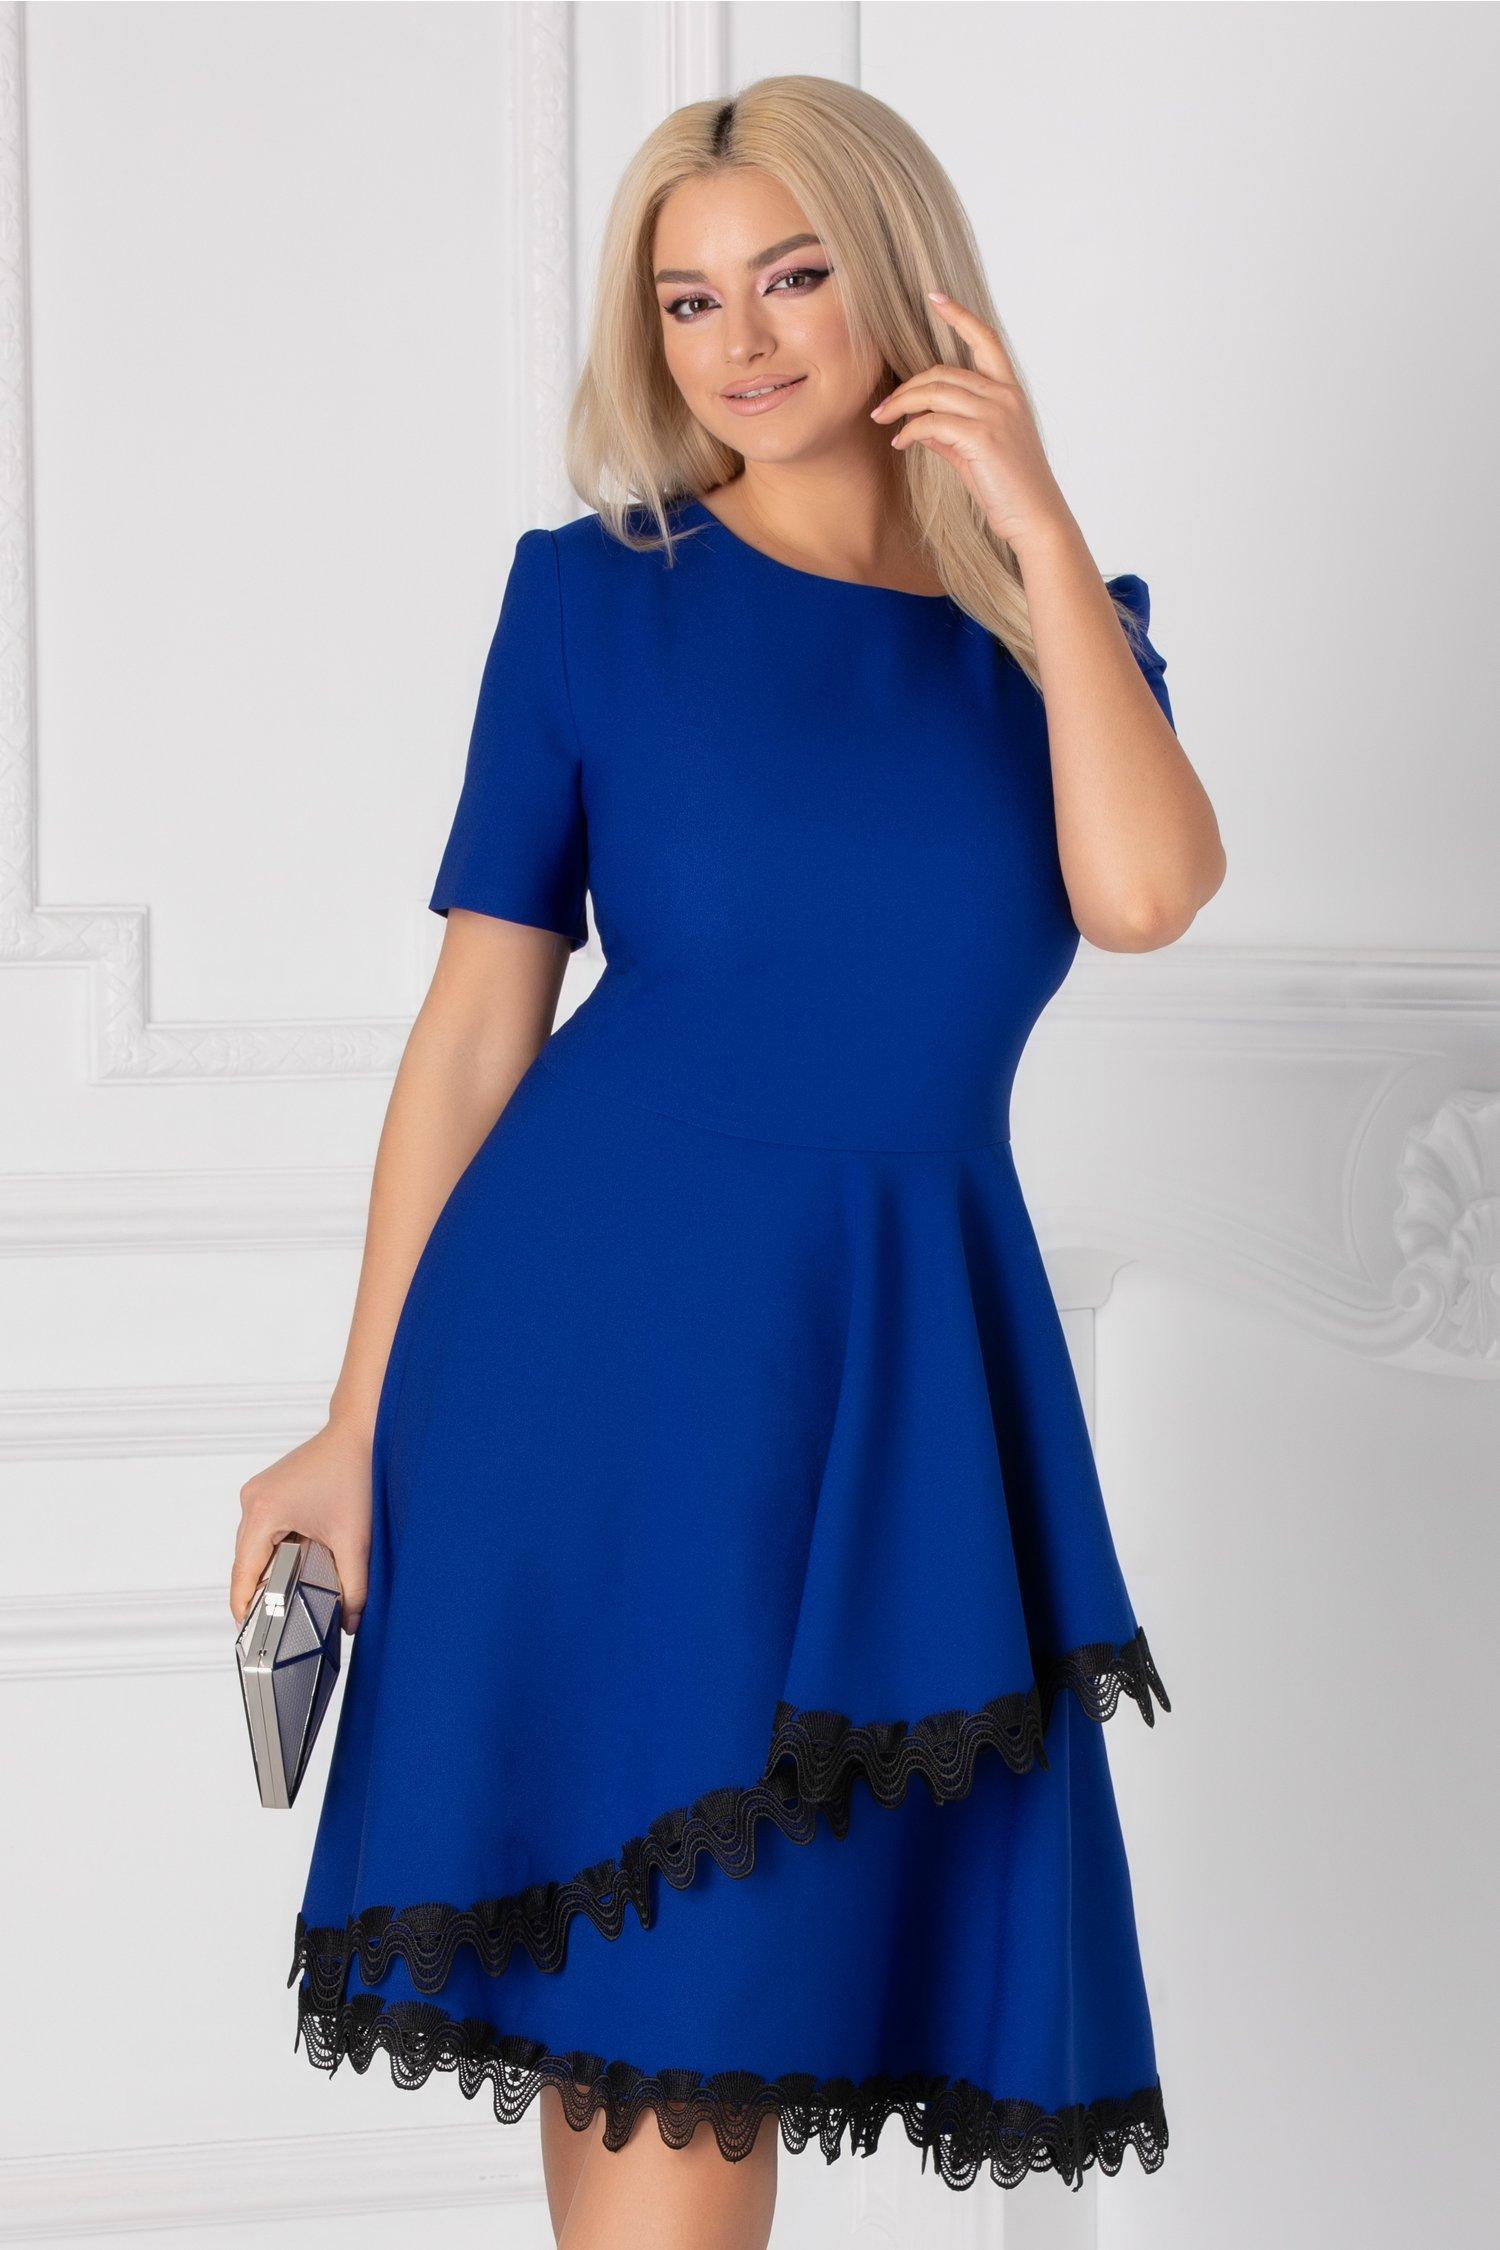 Rochie Penelope albastra cu dantela la baza